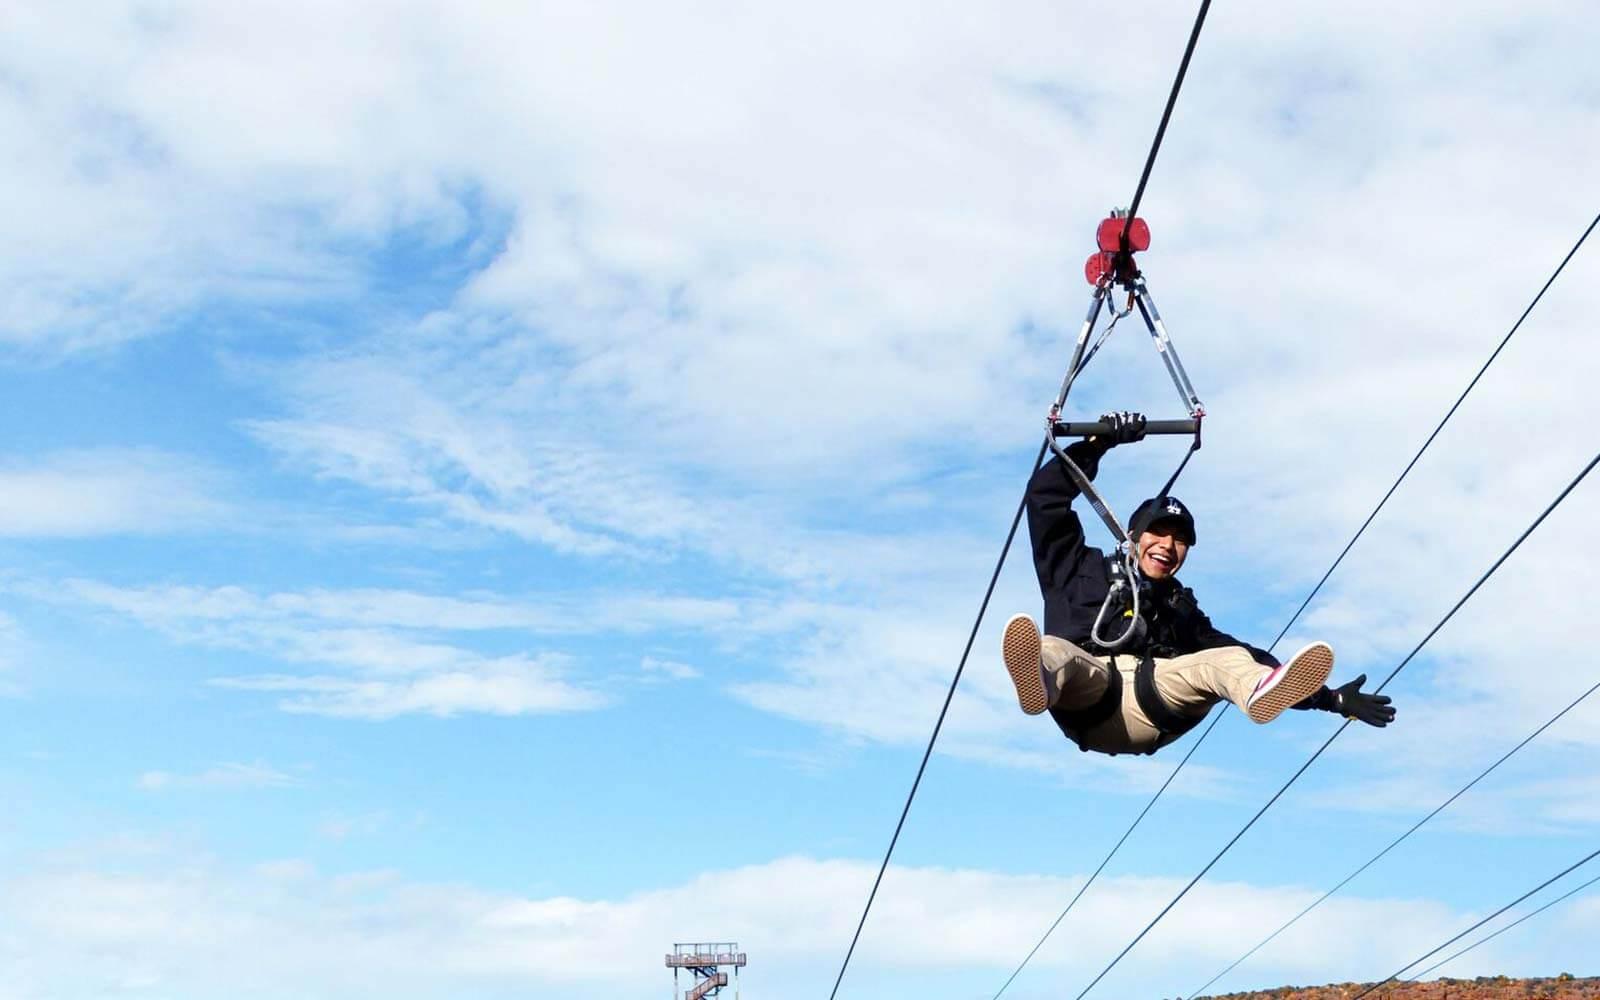 Ride the zipline at Hualapai Ranch at Grand Canyon West